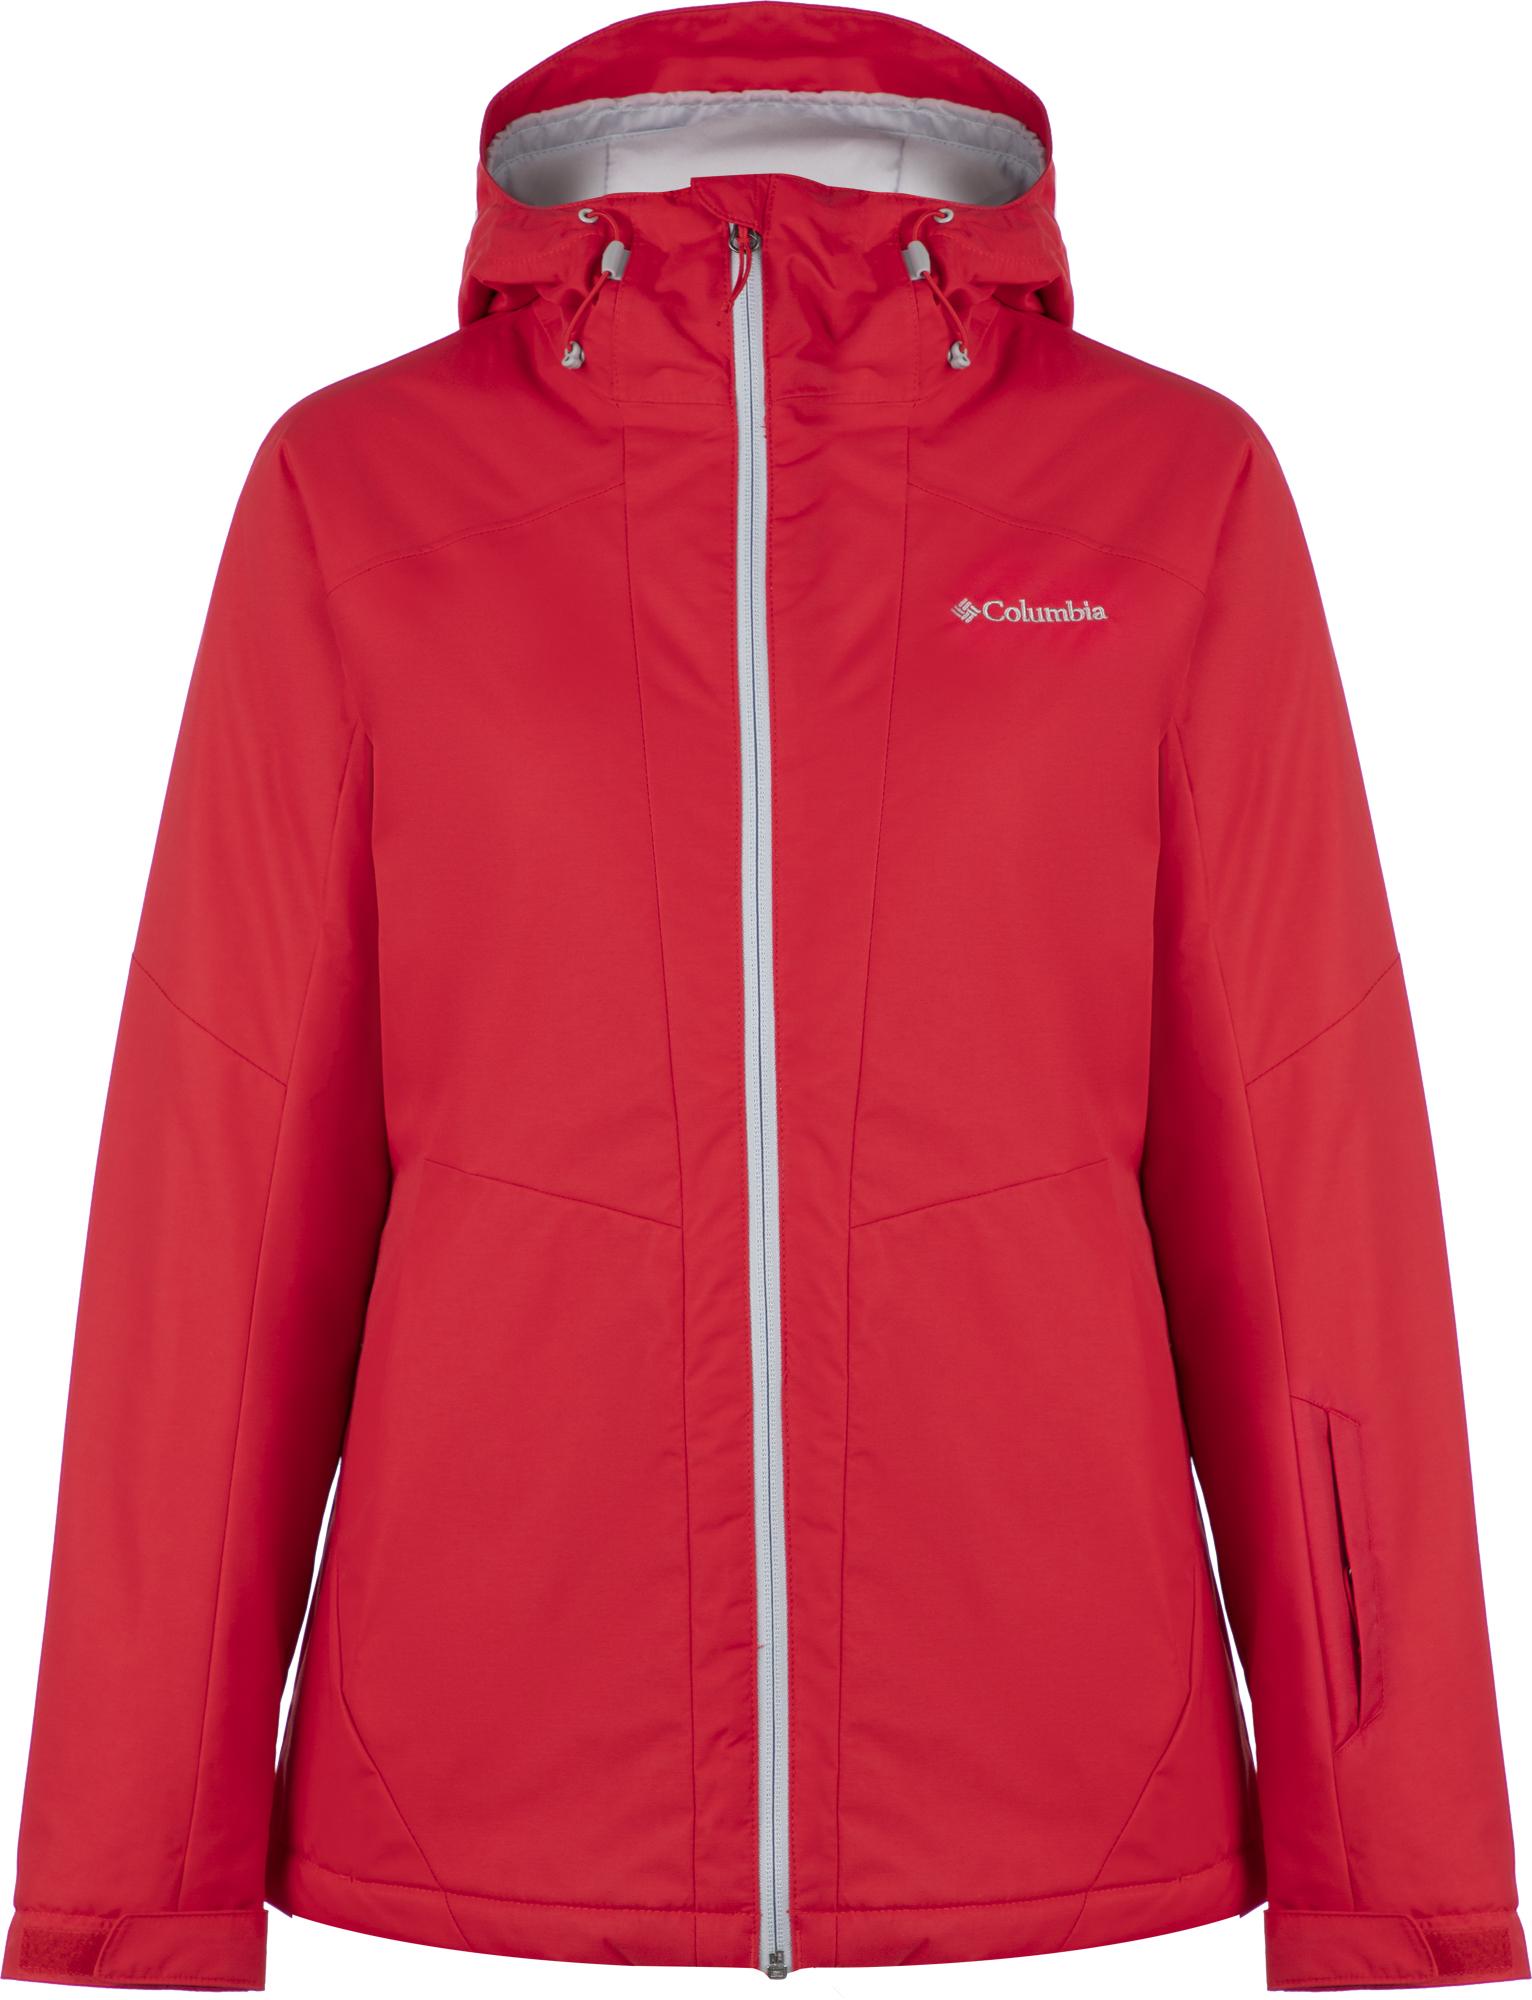 Columbia Куртка утепленная женская Columbia Rivanna Ridge II, размер 46 цена и фото